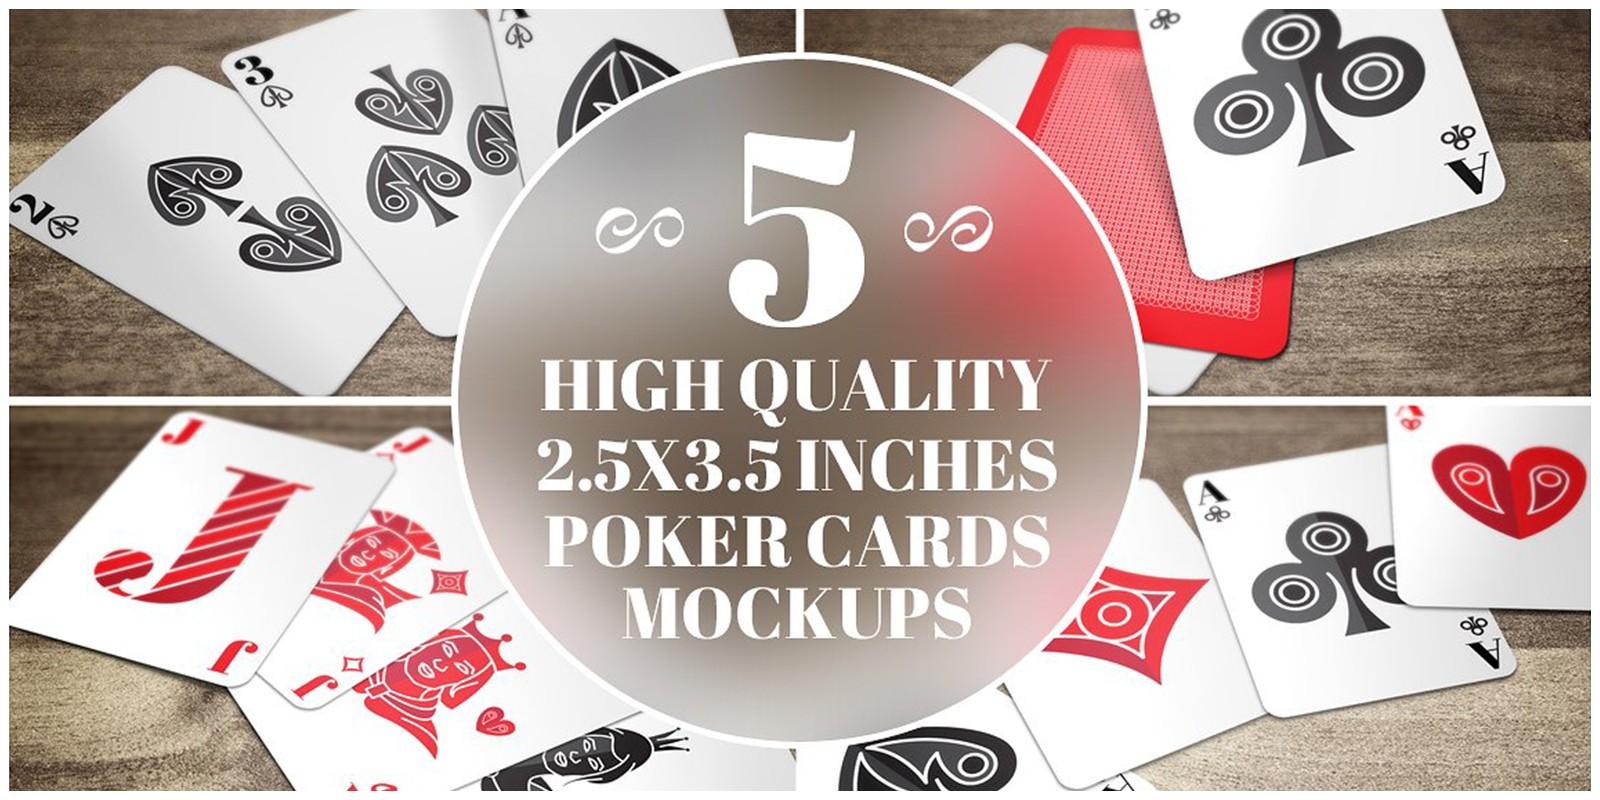 5 Poker Card Mockups